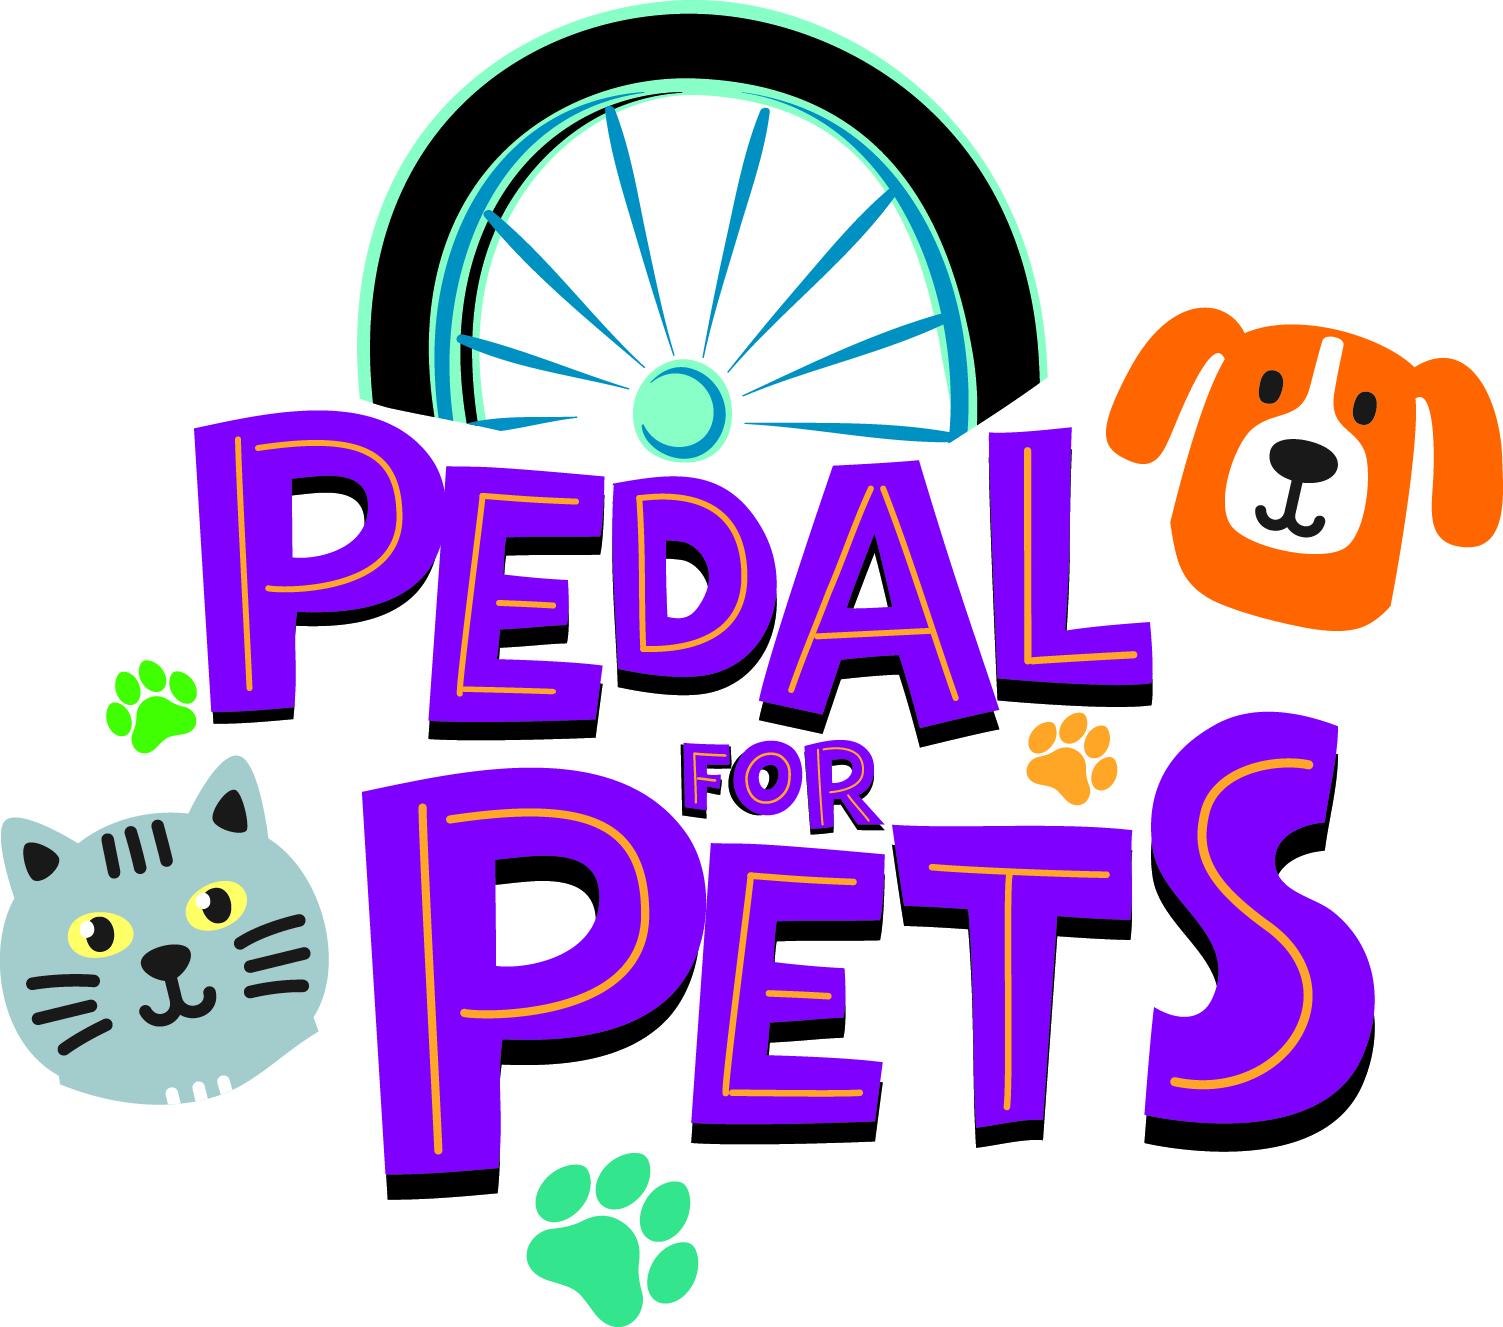 Pedal_For_Pets_CMYK_FINAL.jpg